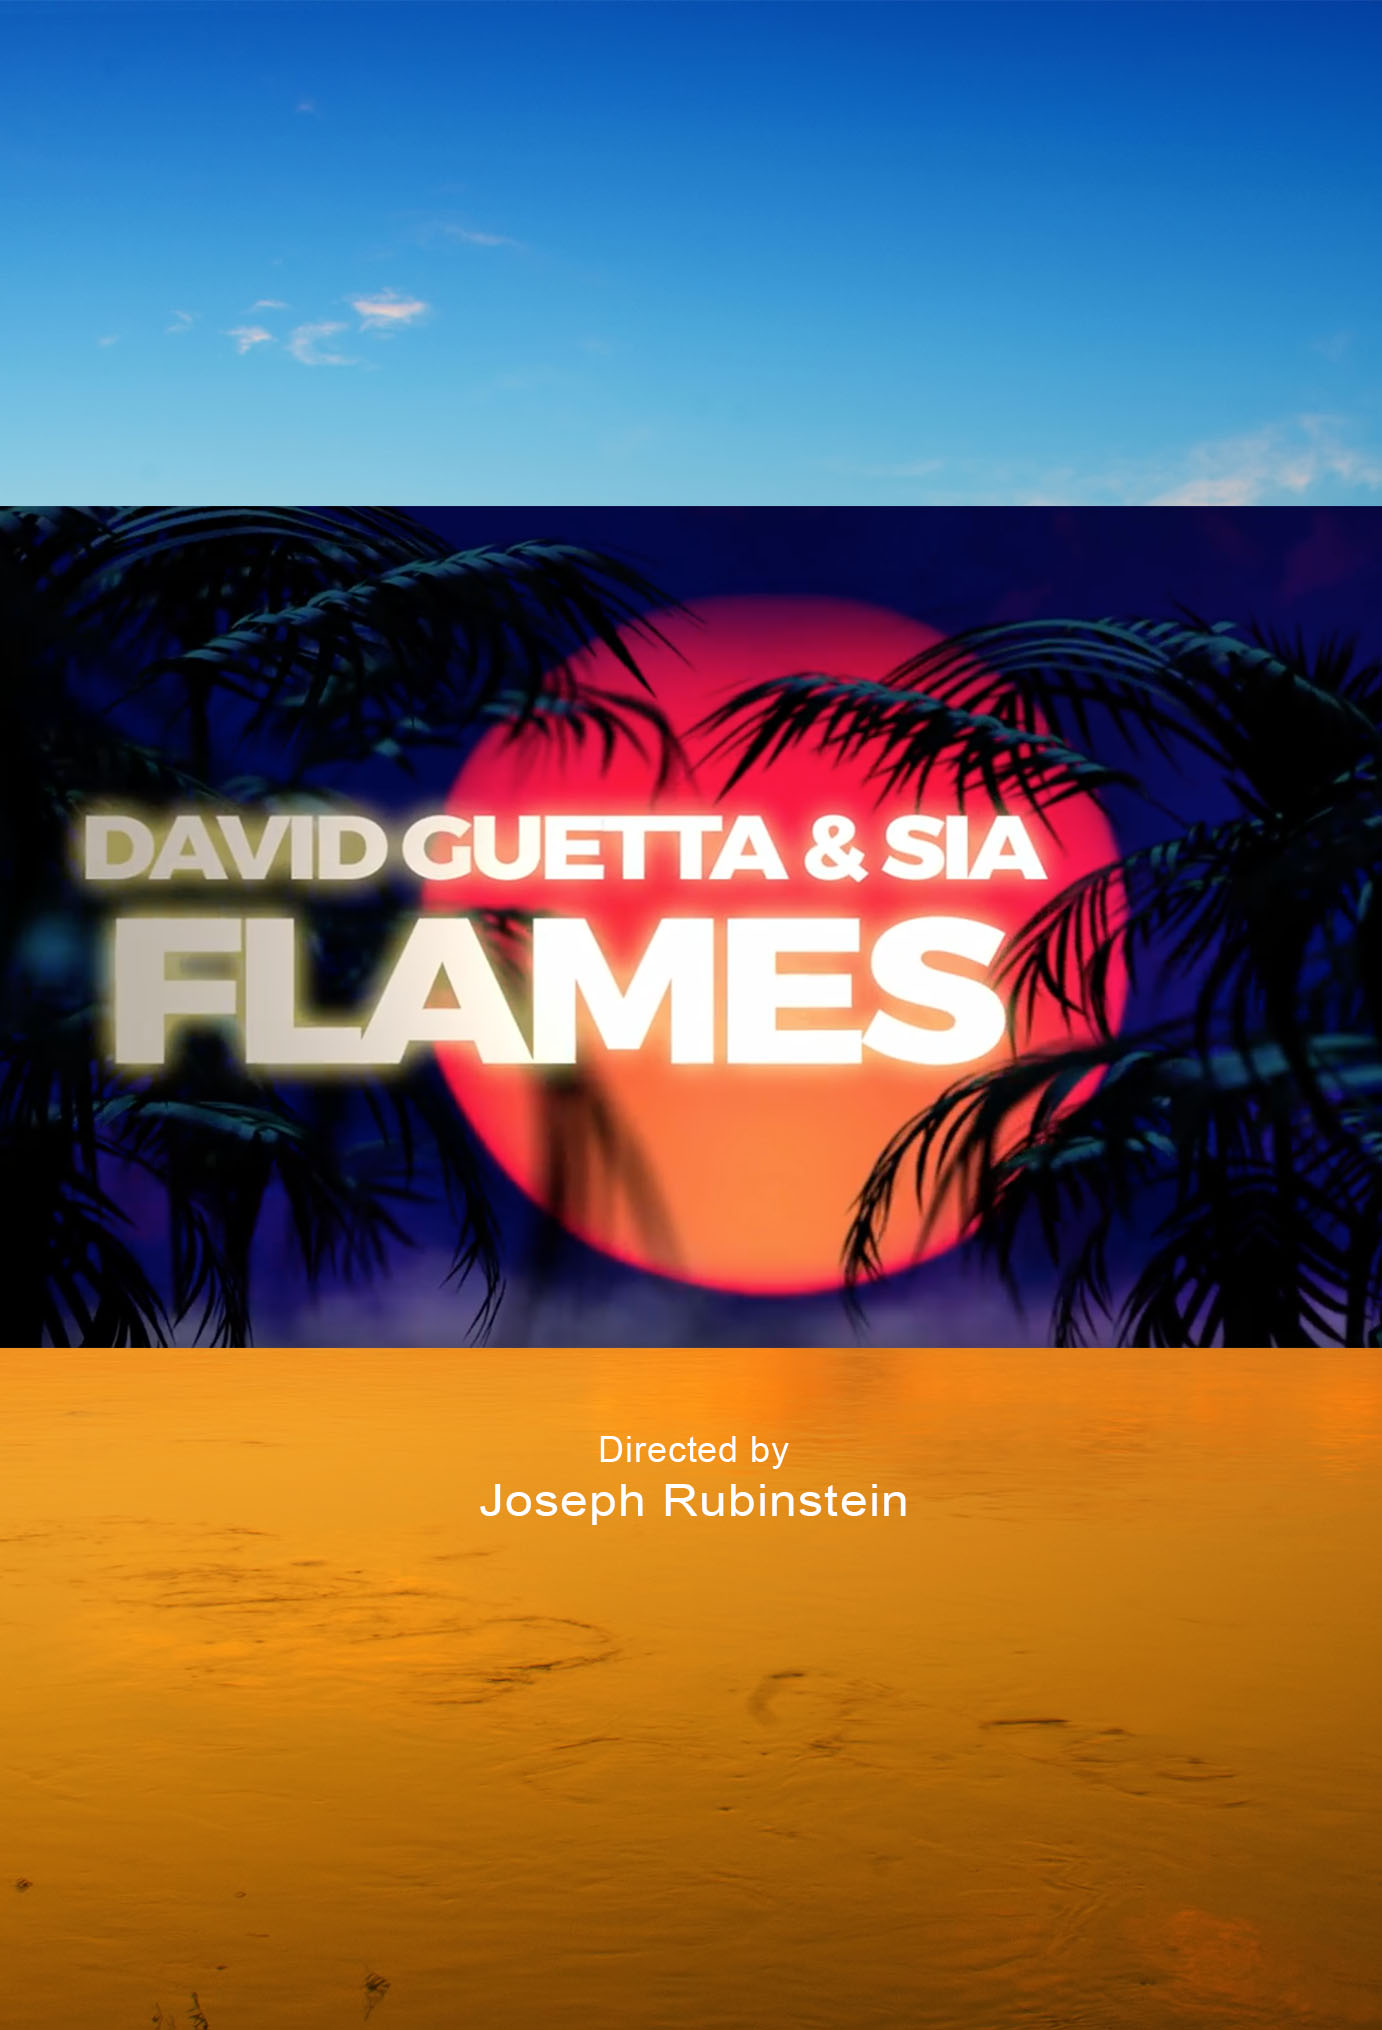 David Guetta Feat  Sia: Flames (Lyric Video) (Video 2018) - IMDb